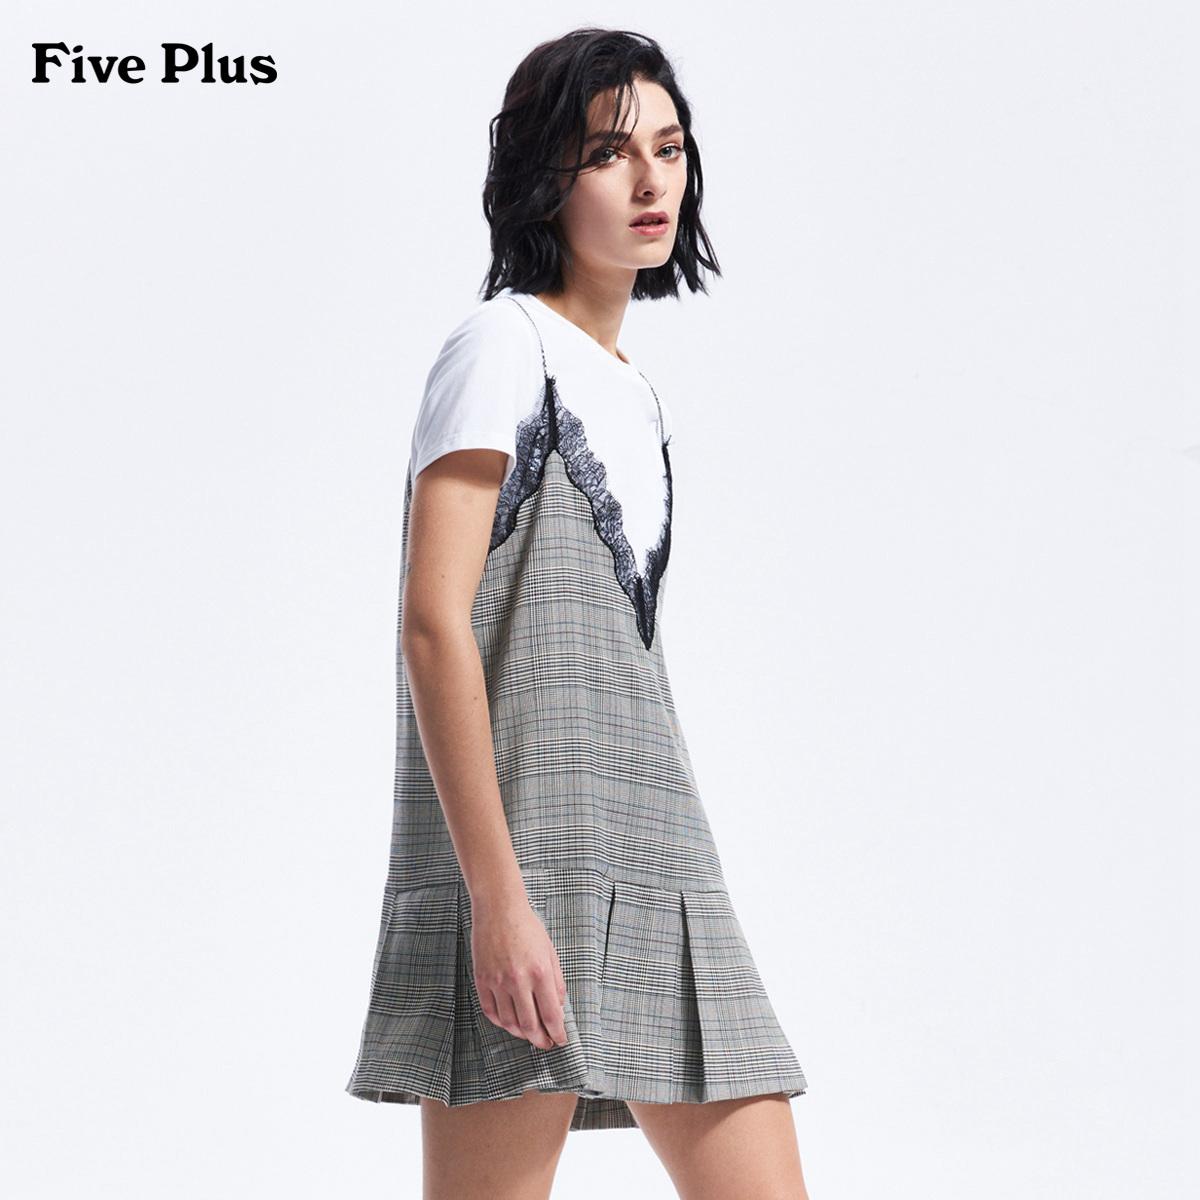 Five Plus2018新品女夏装吊带连衣裙格子百褶裙宽松无袖两件套装